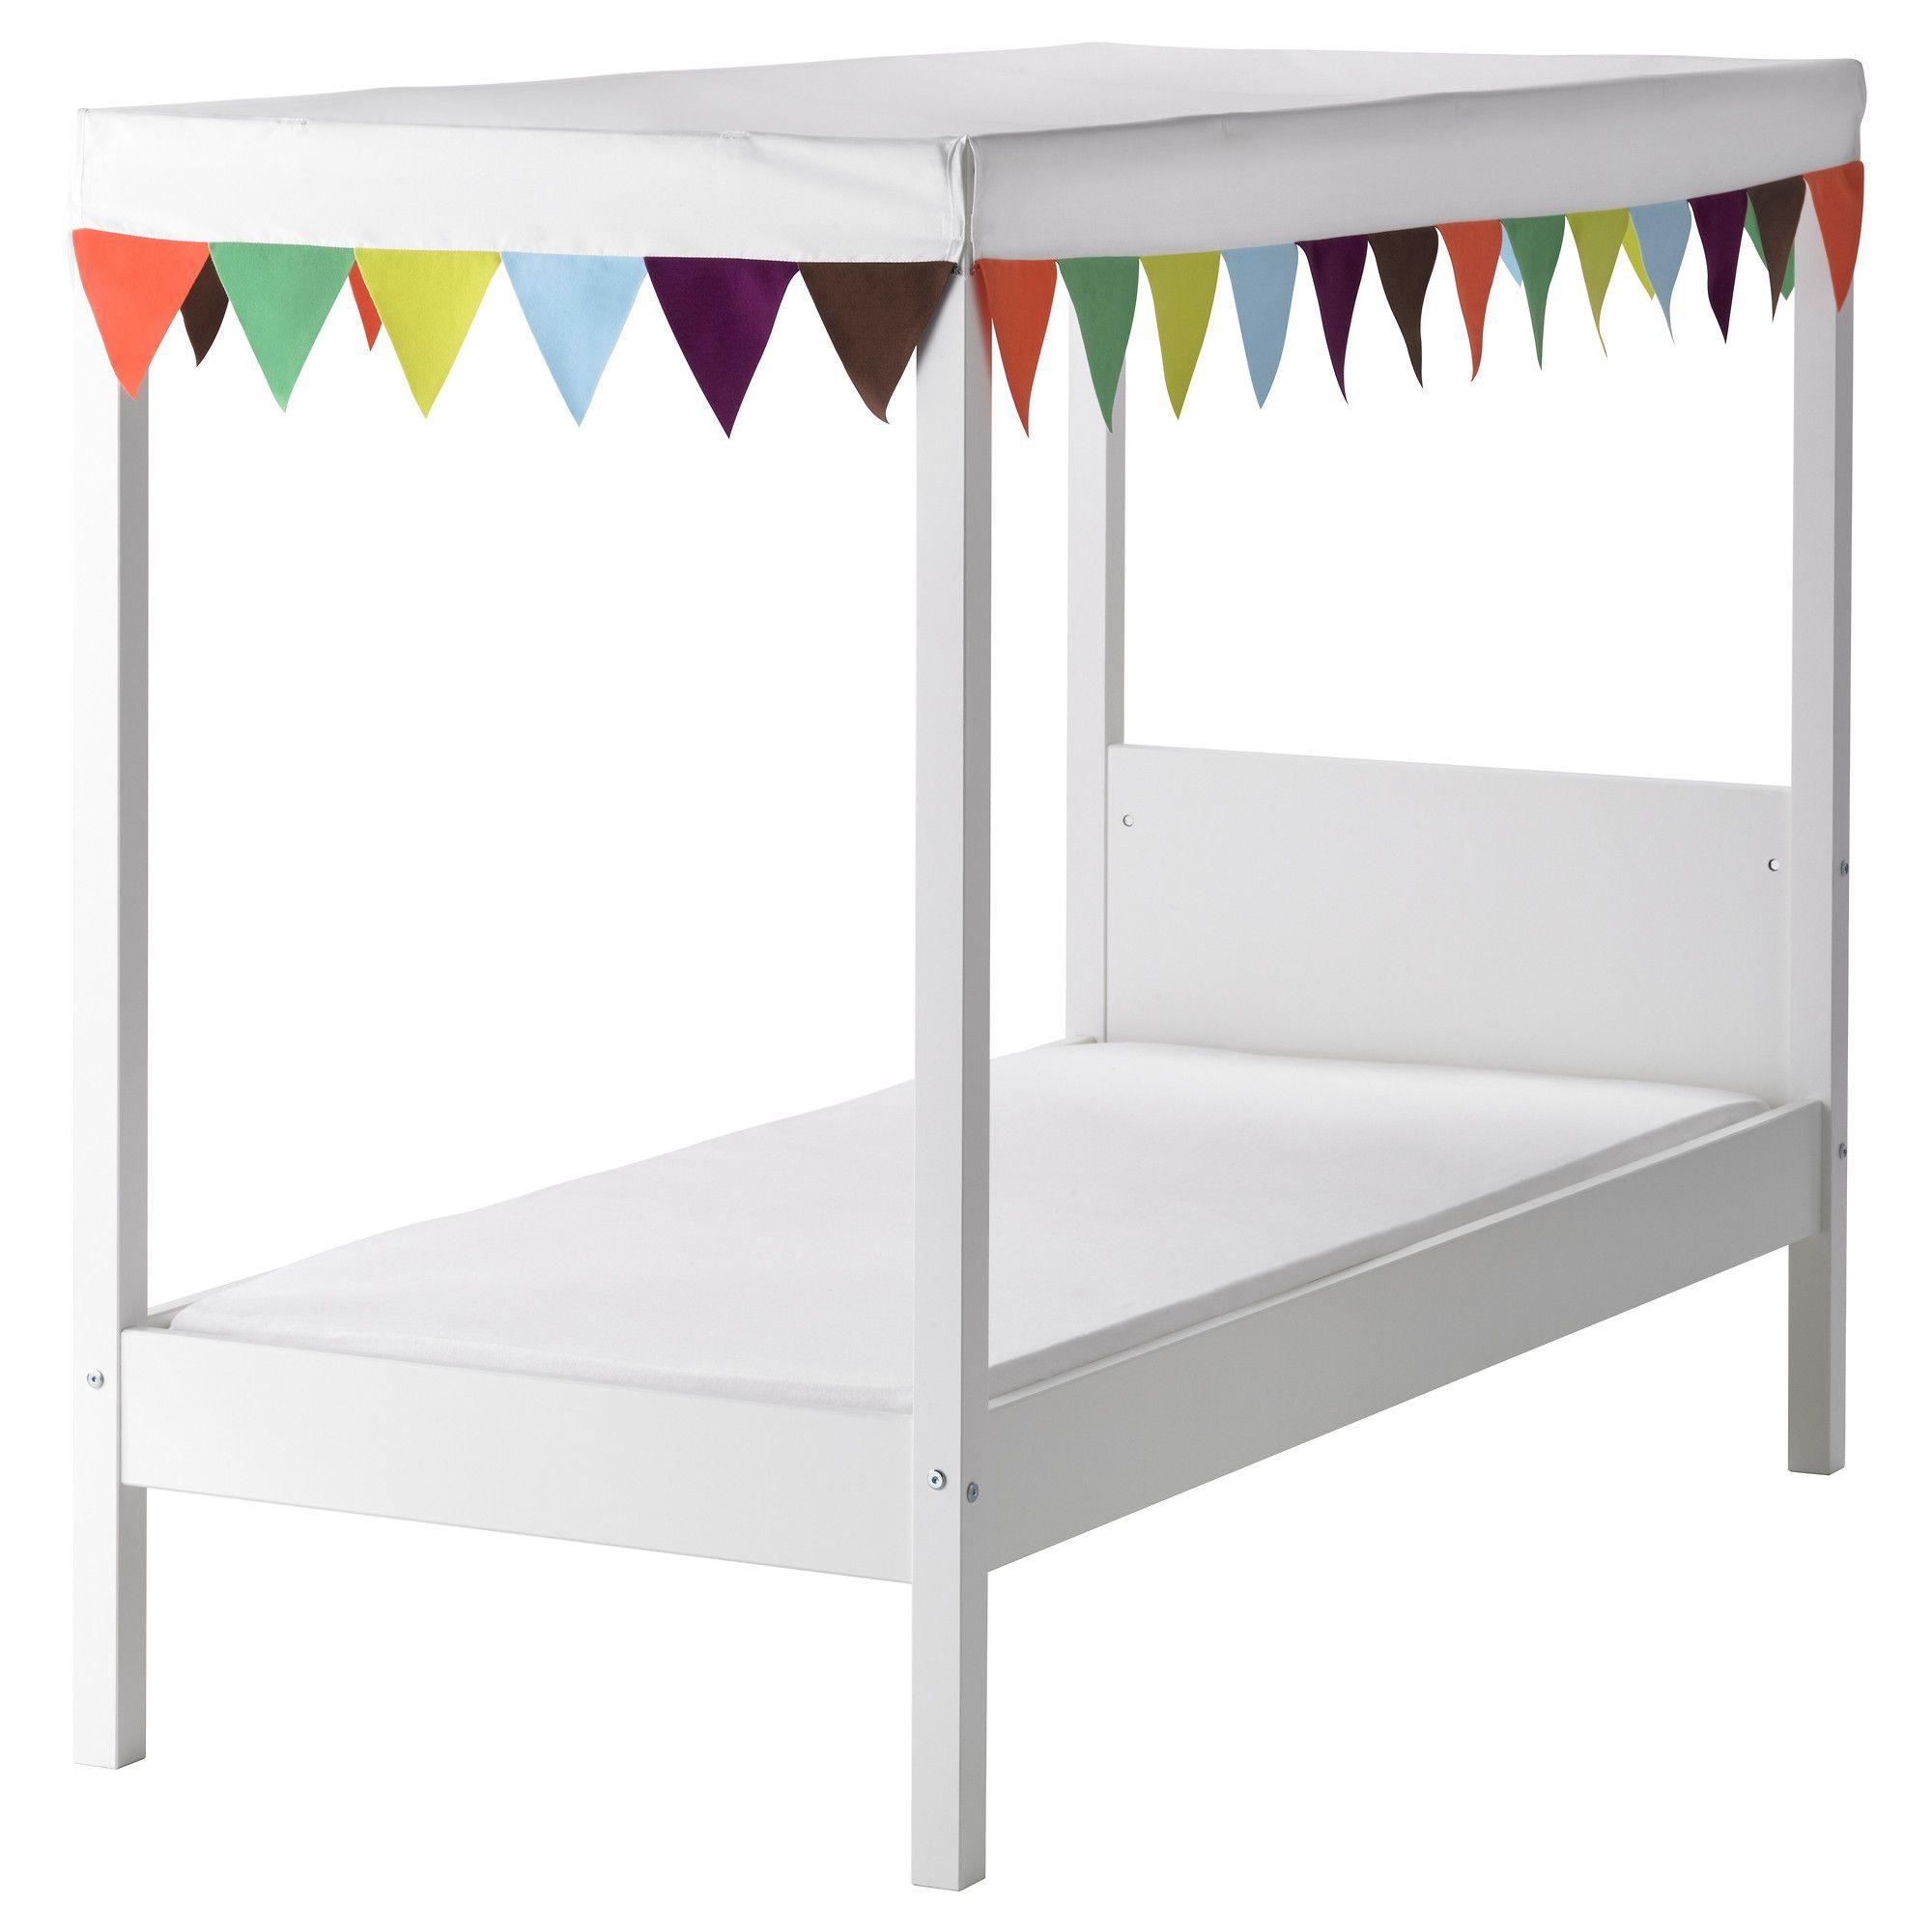 Ciel De Lit Ikea Inspirant –vre Bedframe M Lattenbodem Bedhemel Ikea